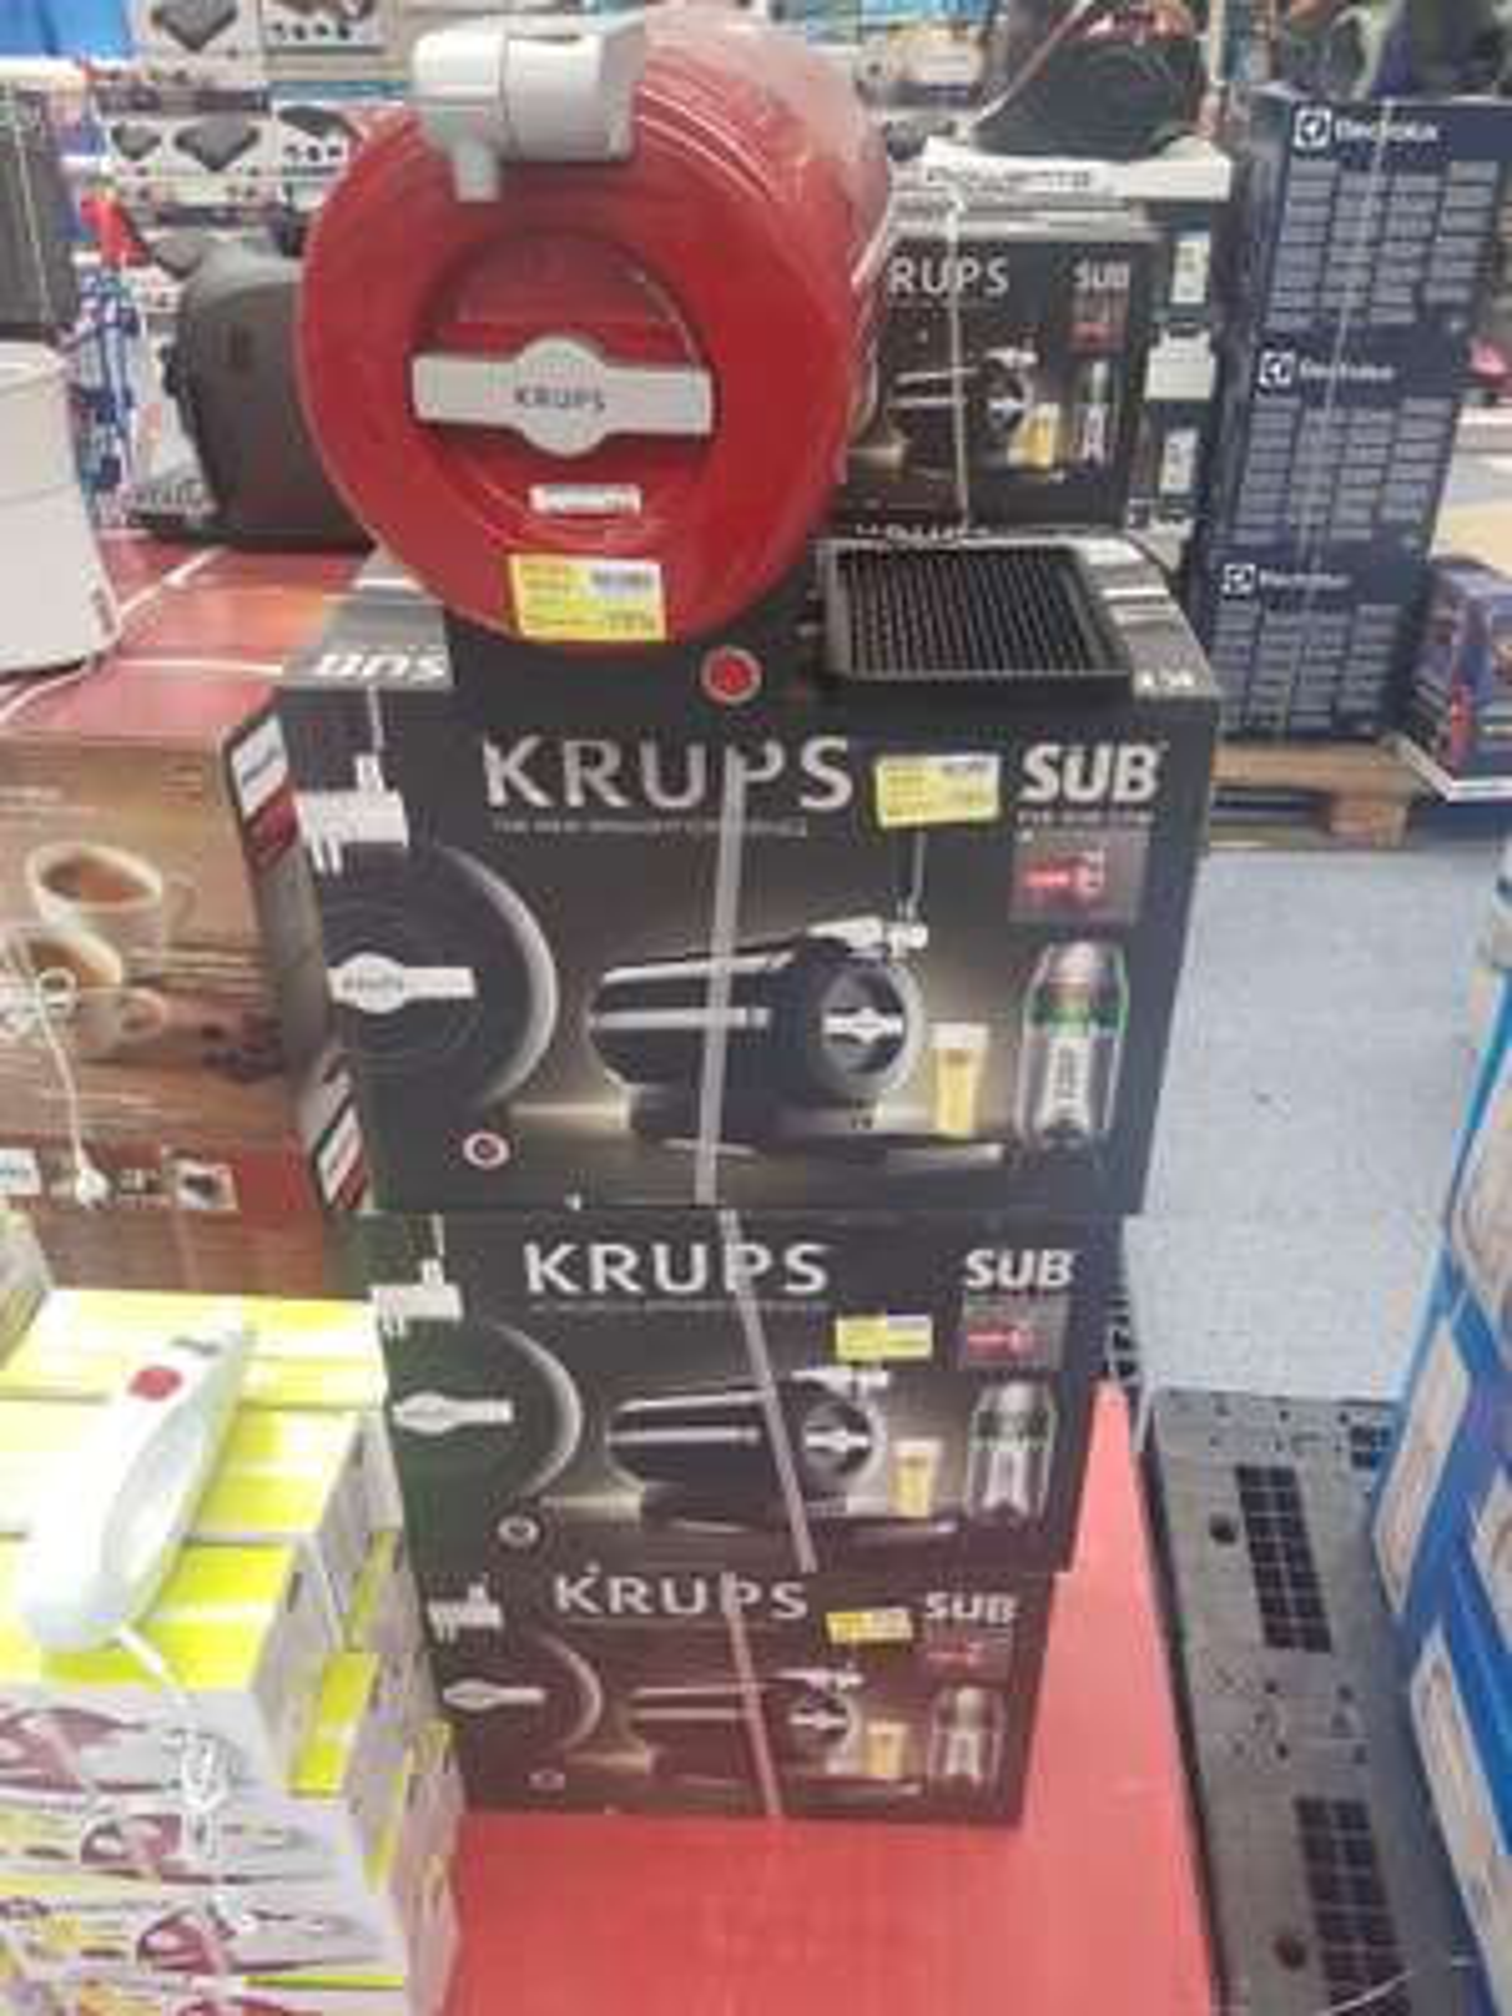 Machine a biere krups VB650510 - Rosny 2 (93)